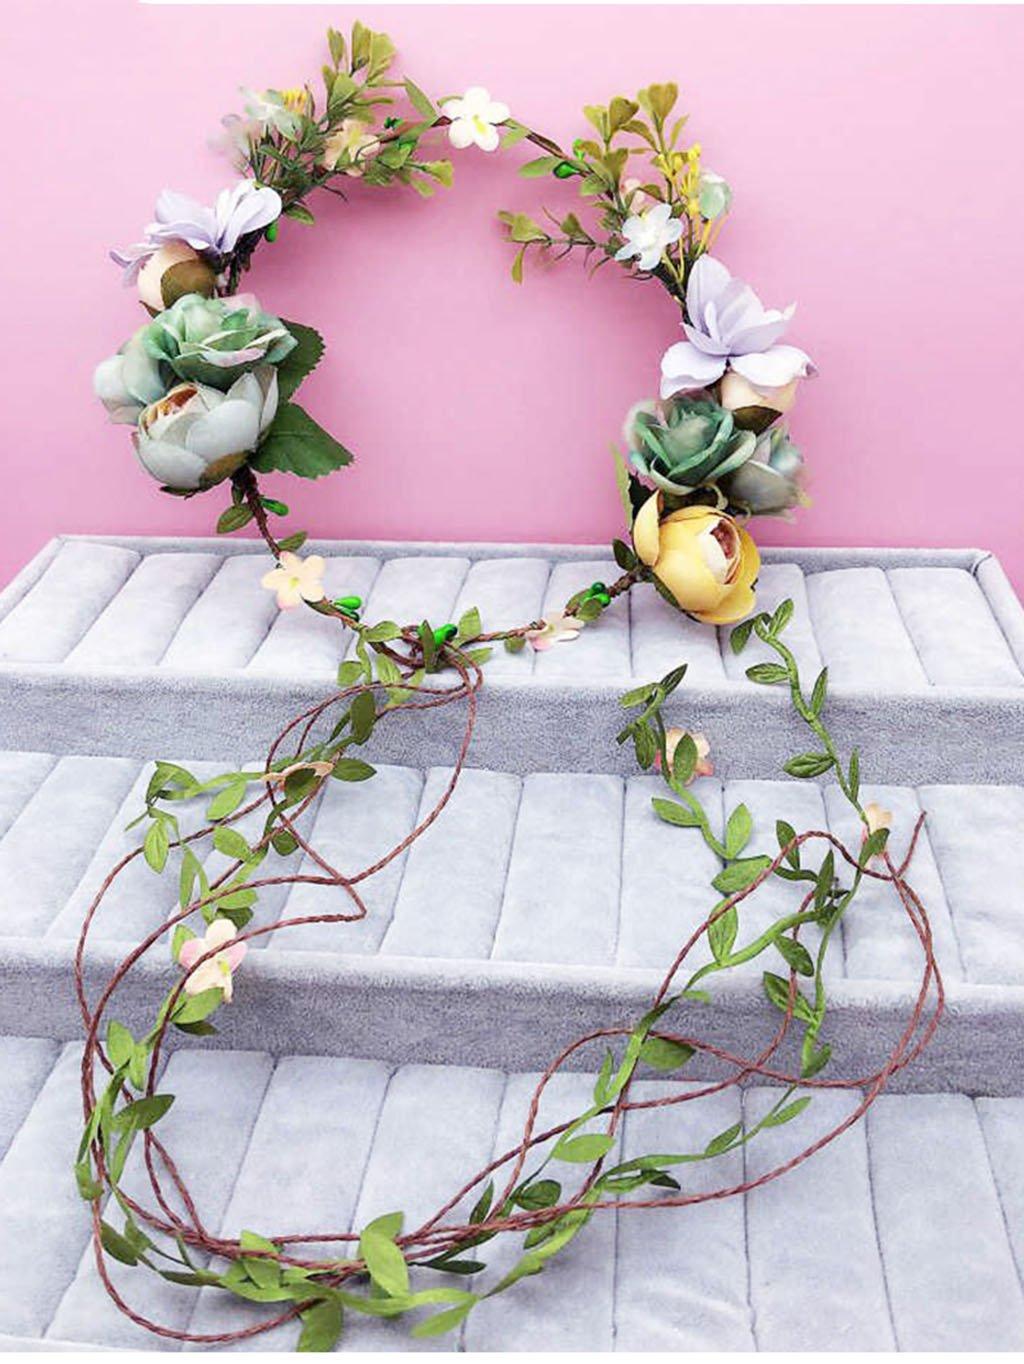 Wreath Flower, Headband Flower Garland Handmade Wedding Bride Party Ribbon Headband Wristband Hairband Red (Color : B) by Wreath